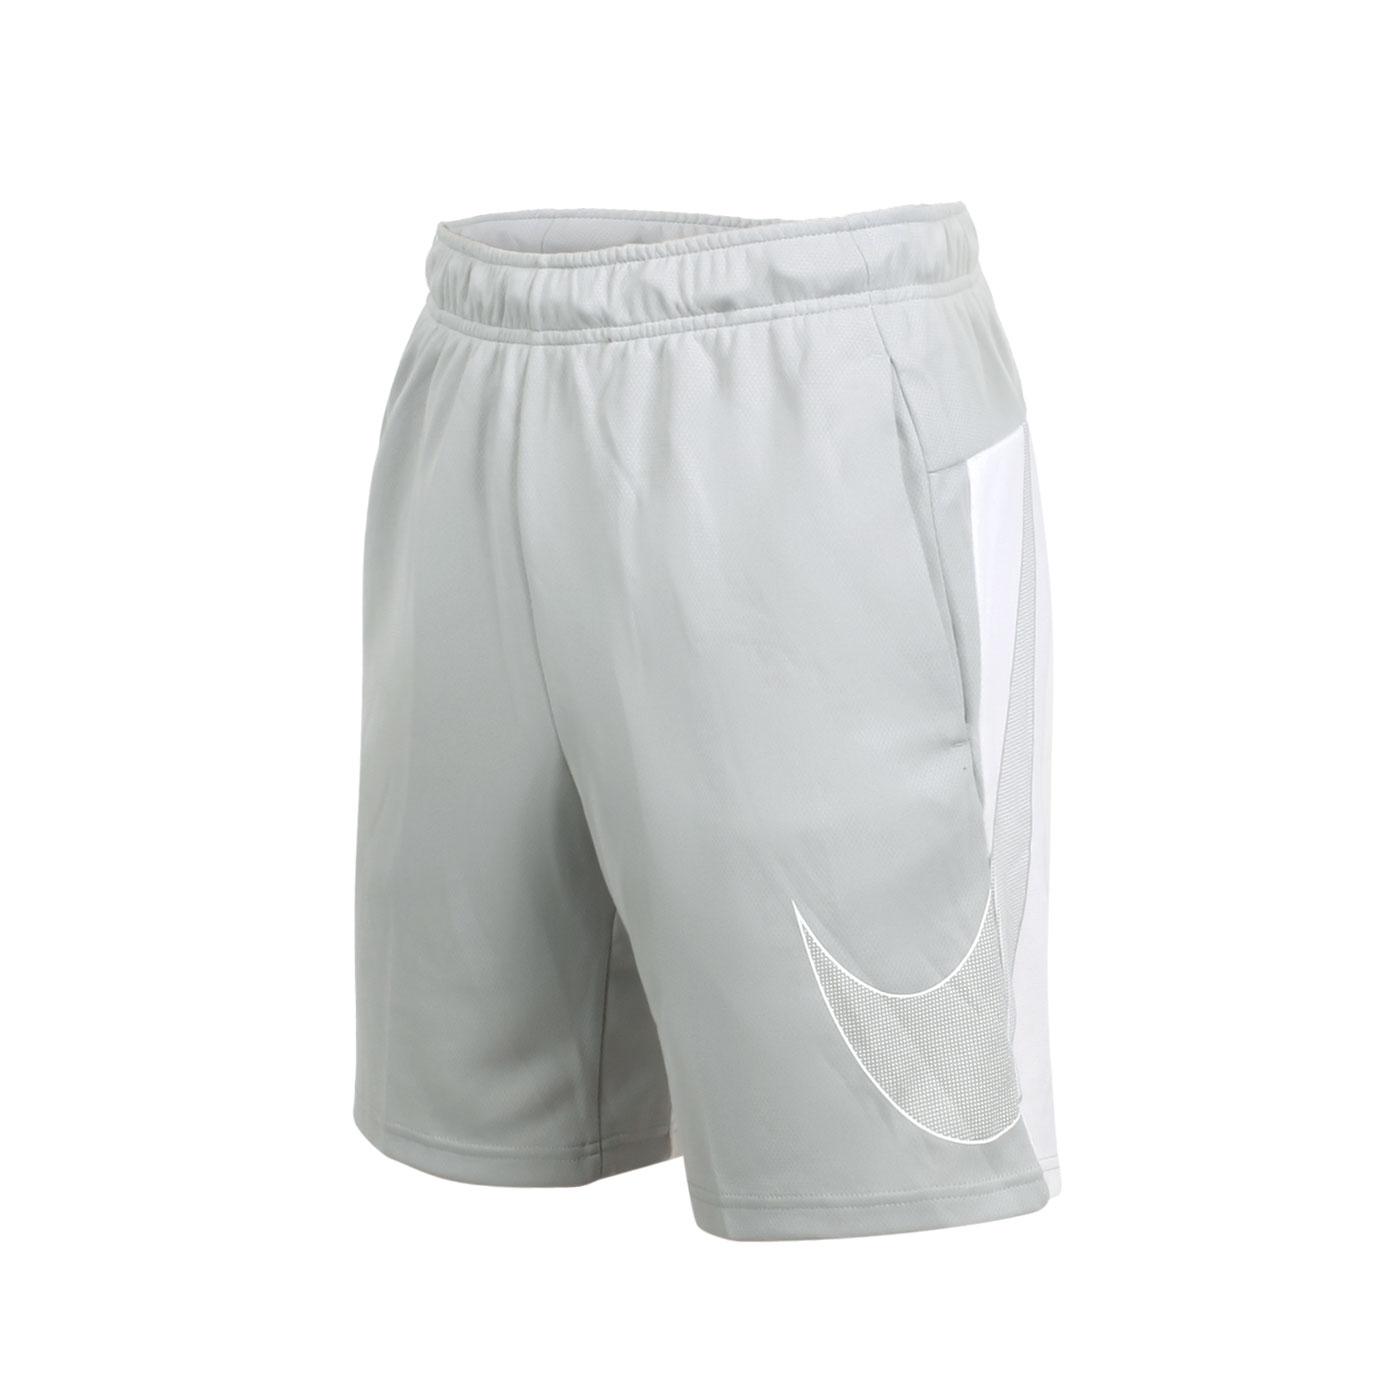 NIKE 男款運動短褲 CJ6690-077 - 灰白